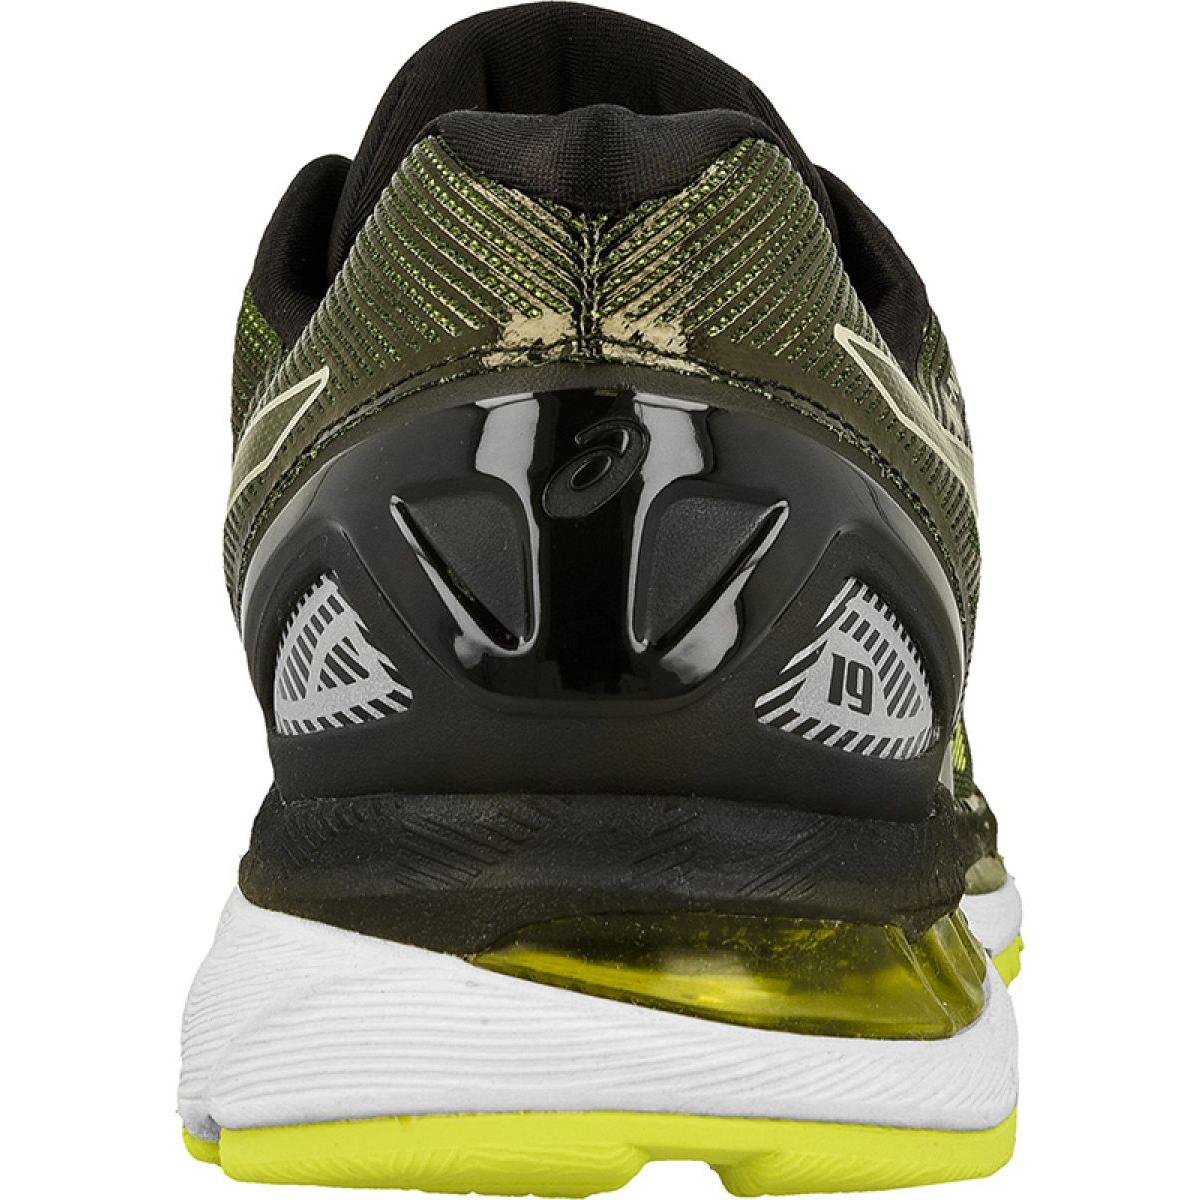 low priced 9604e e3fa3 Running shoes Asics Gel-Nimbus 19 M T700N-9007